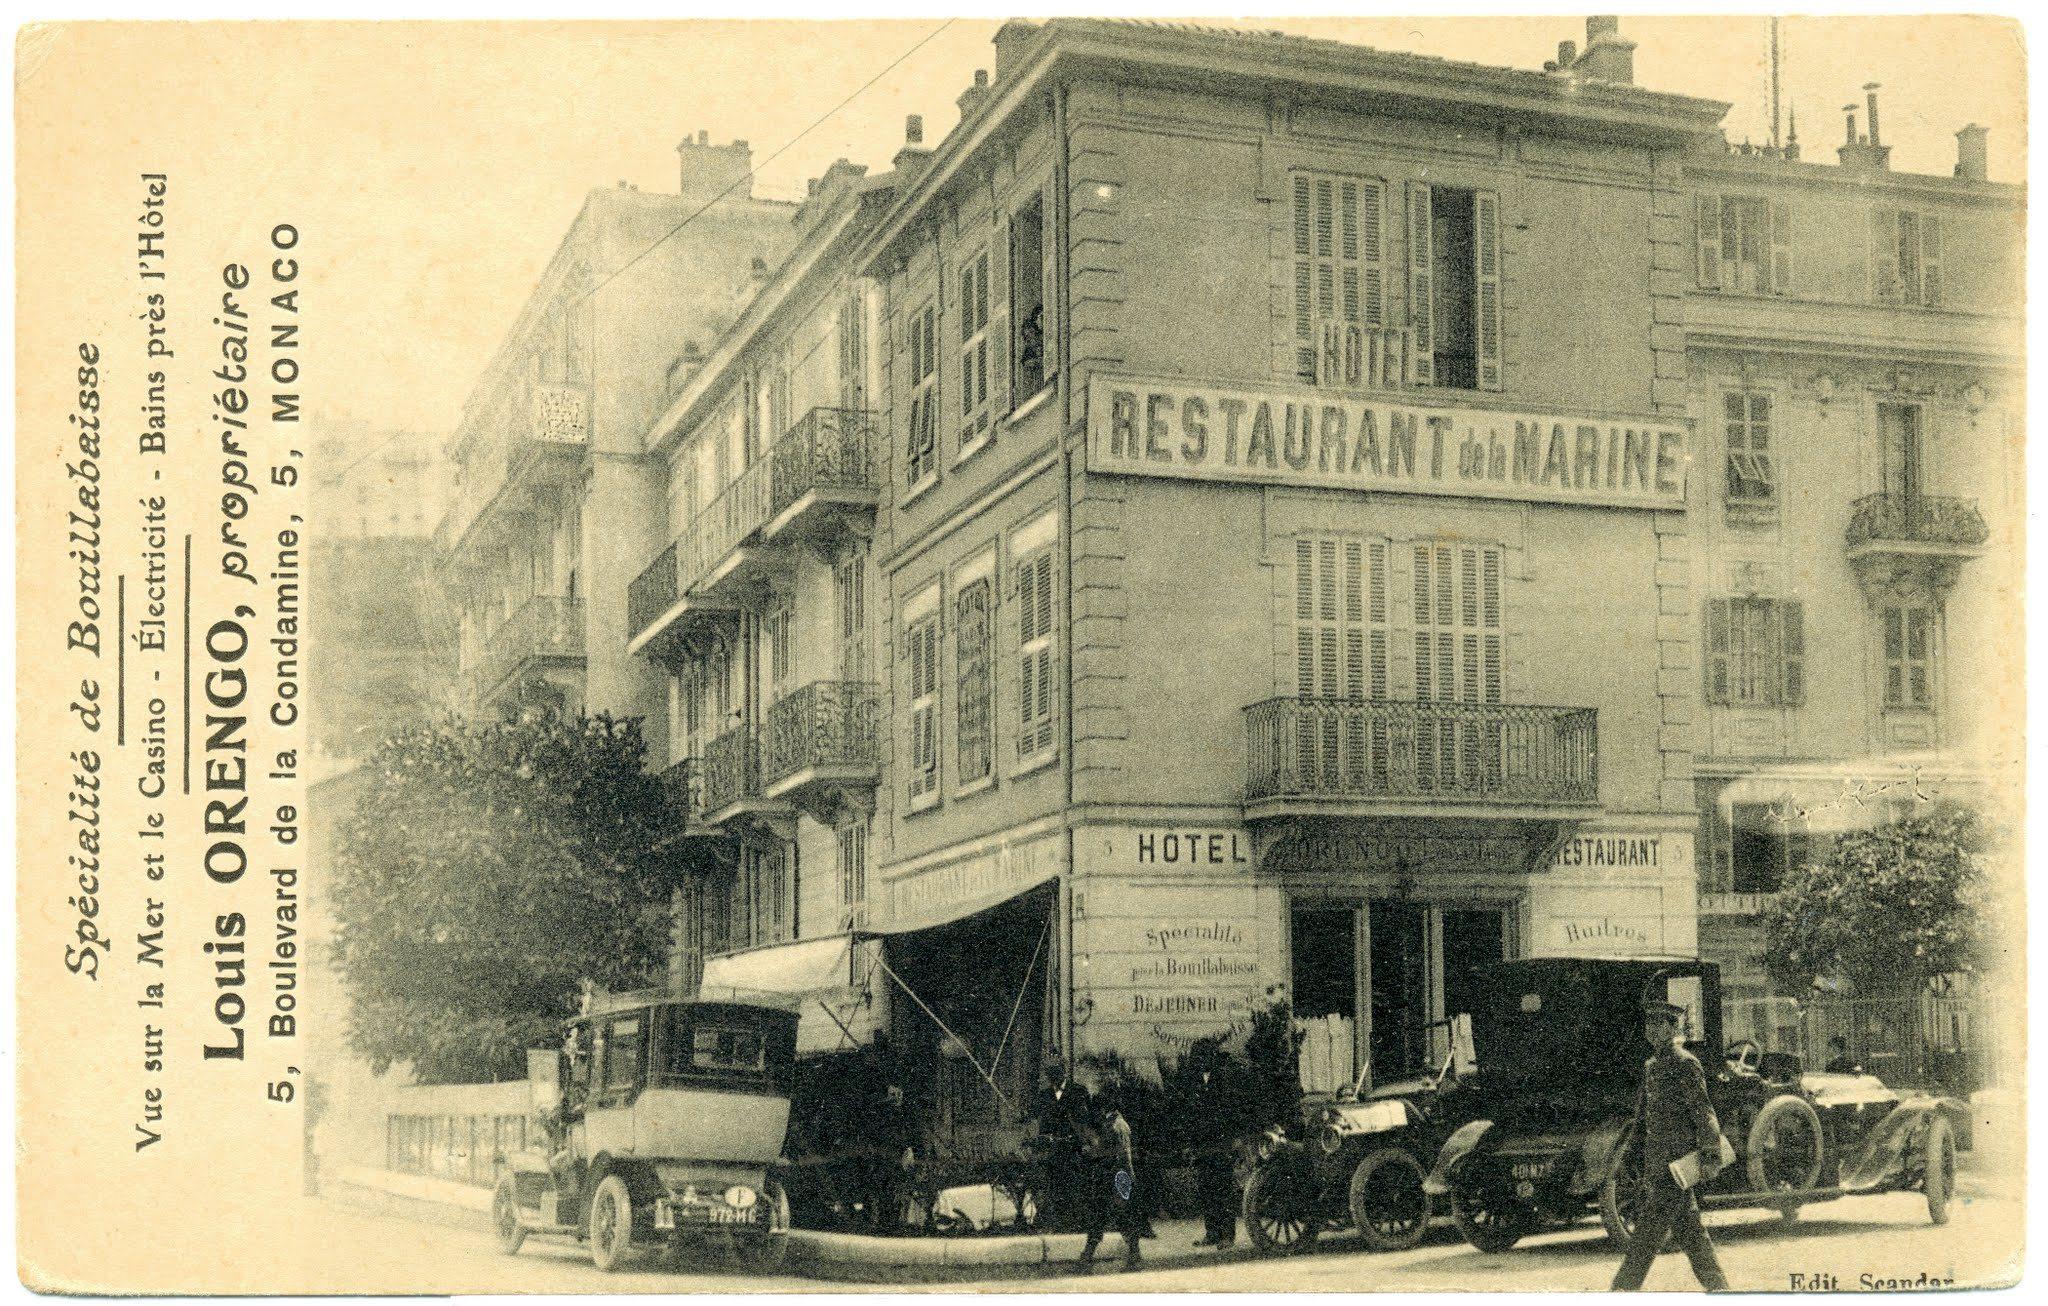 Monaco h tel restaurant de la marine la carte postale for Chaine hotel restaurant